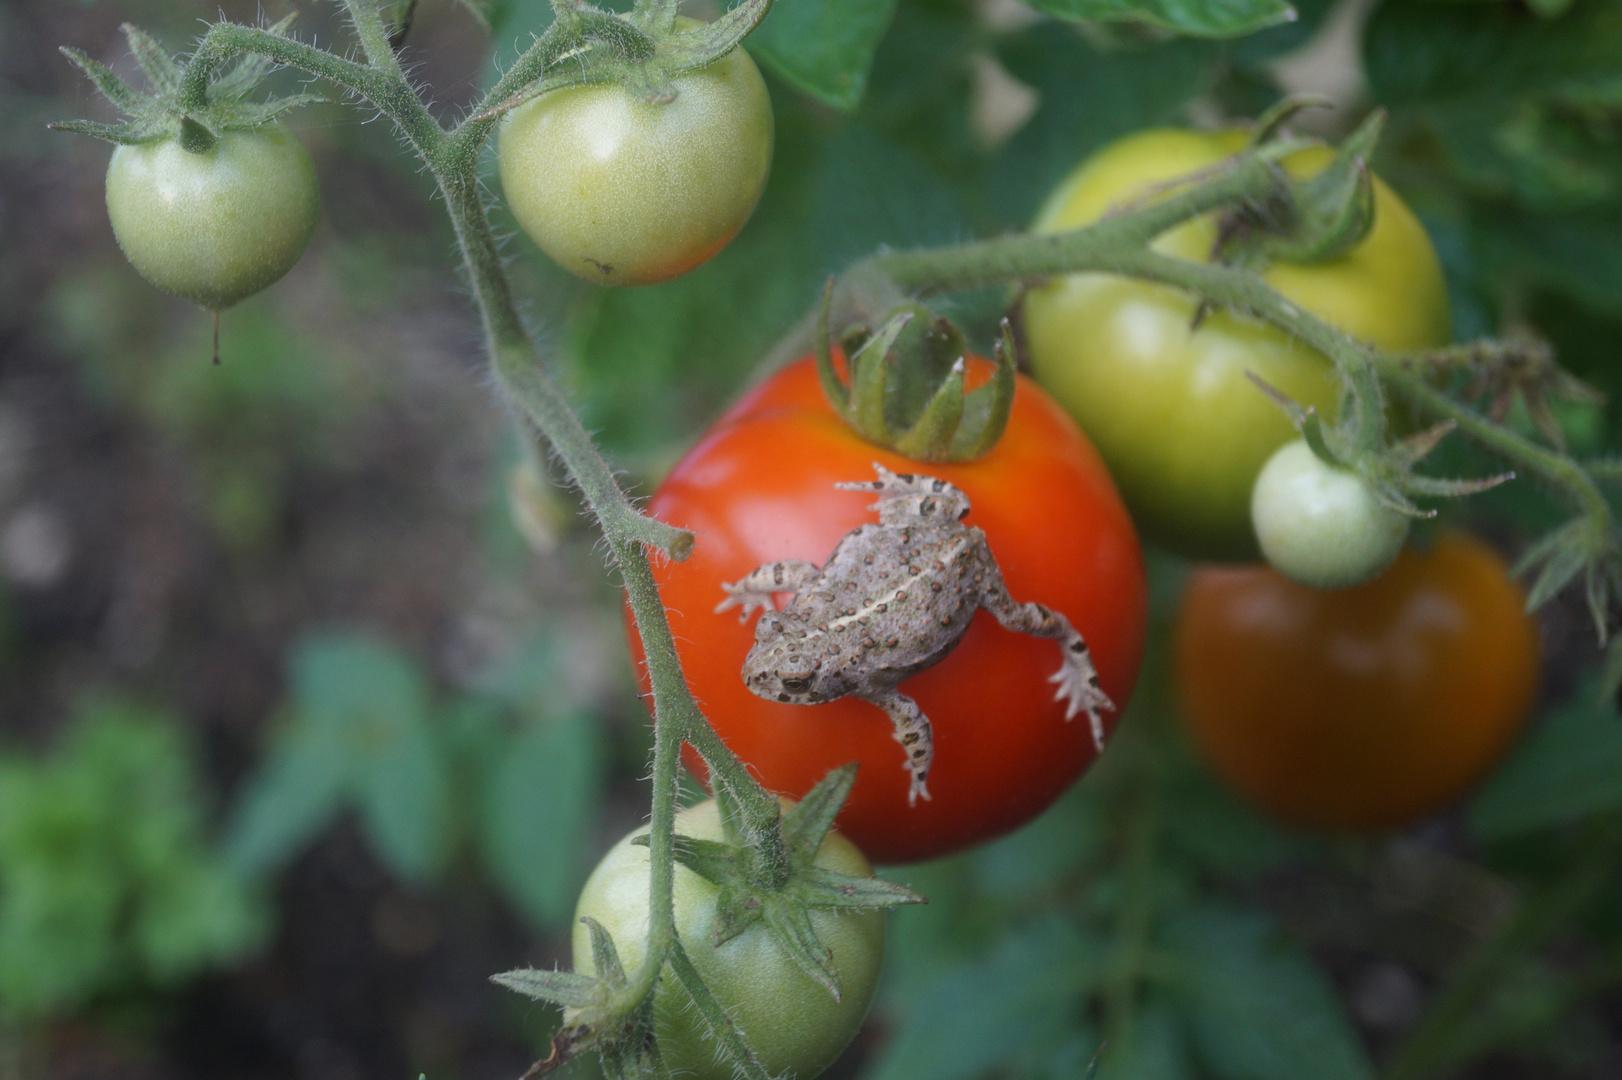 Kröte auf Tomate